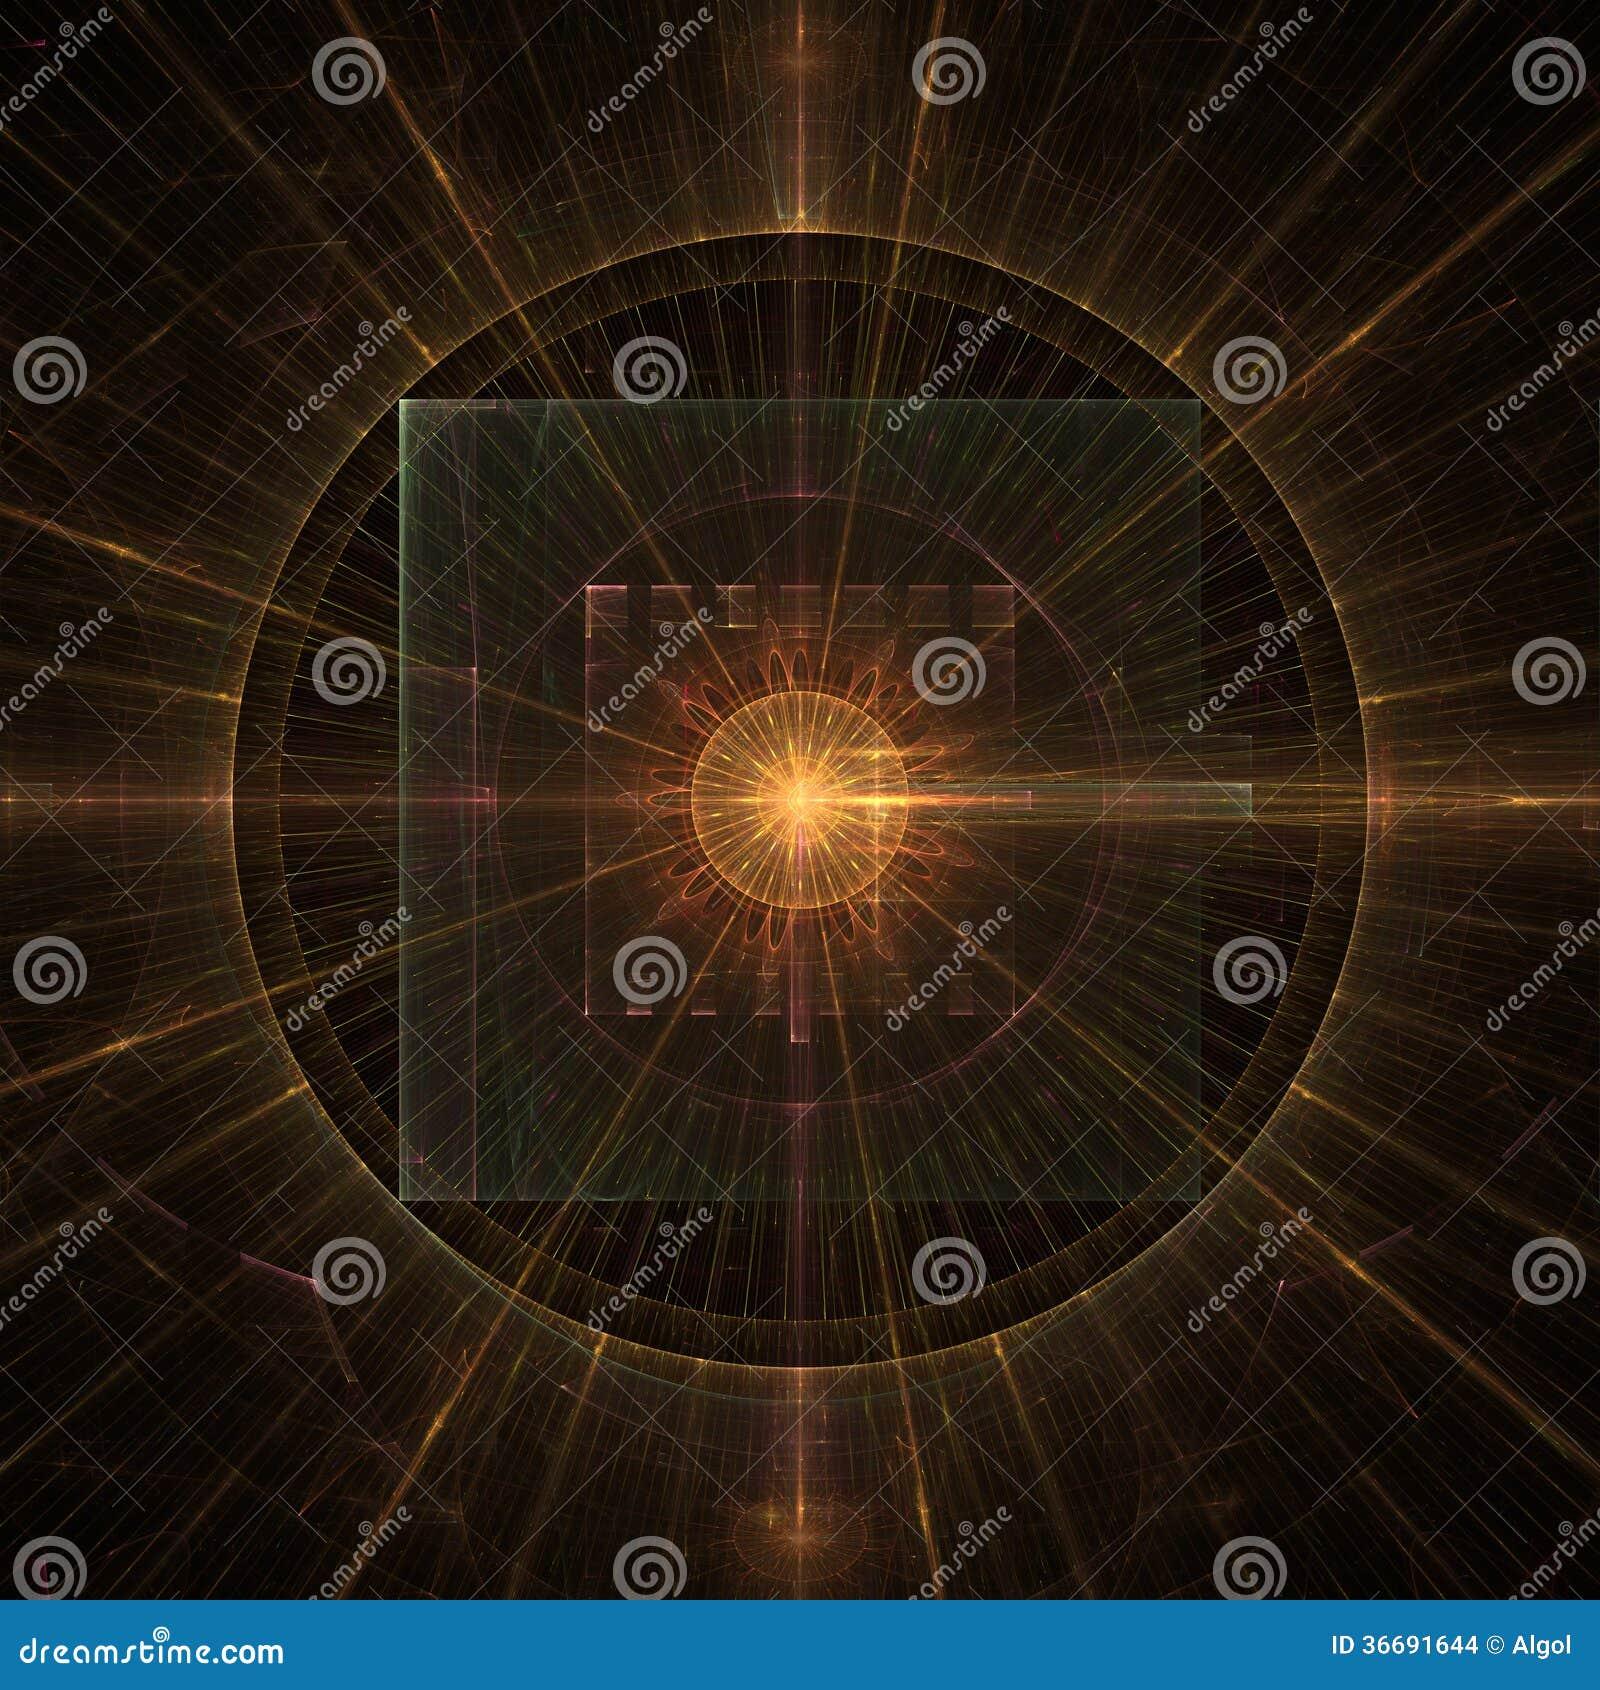 illustration fractal background clocks - photo #2